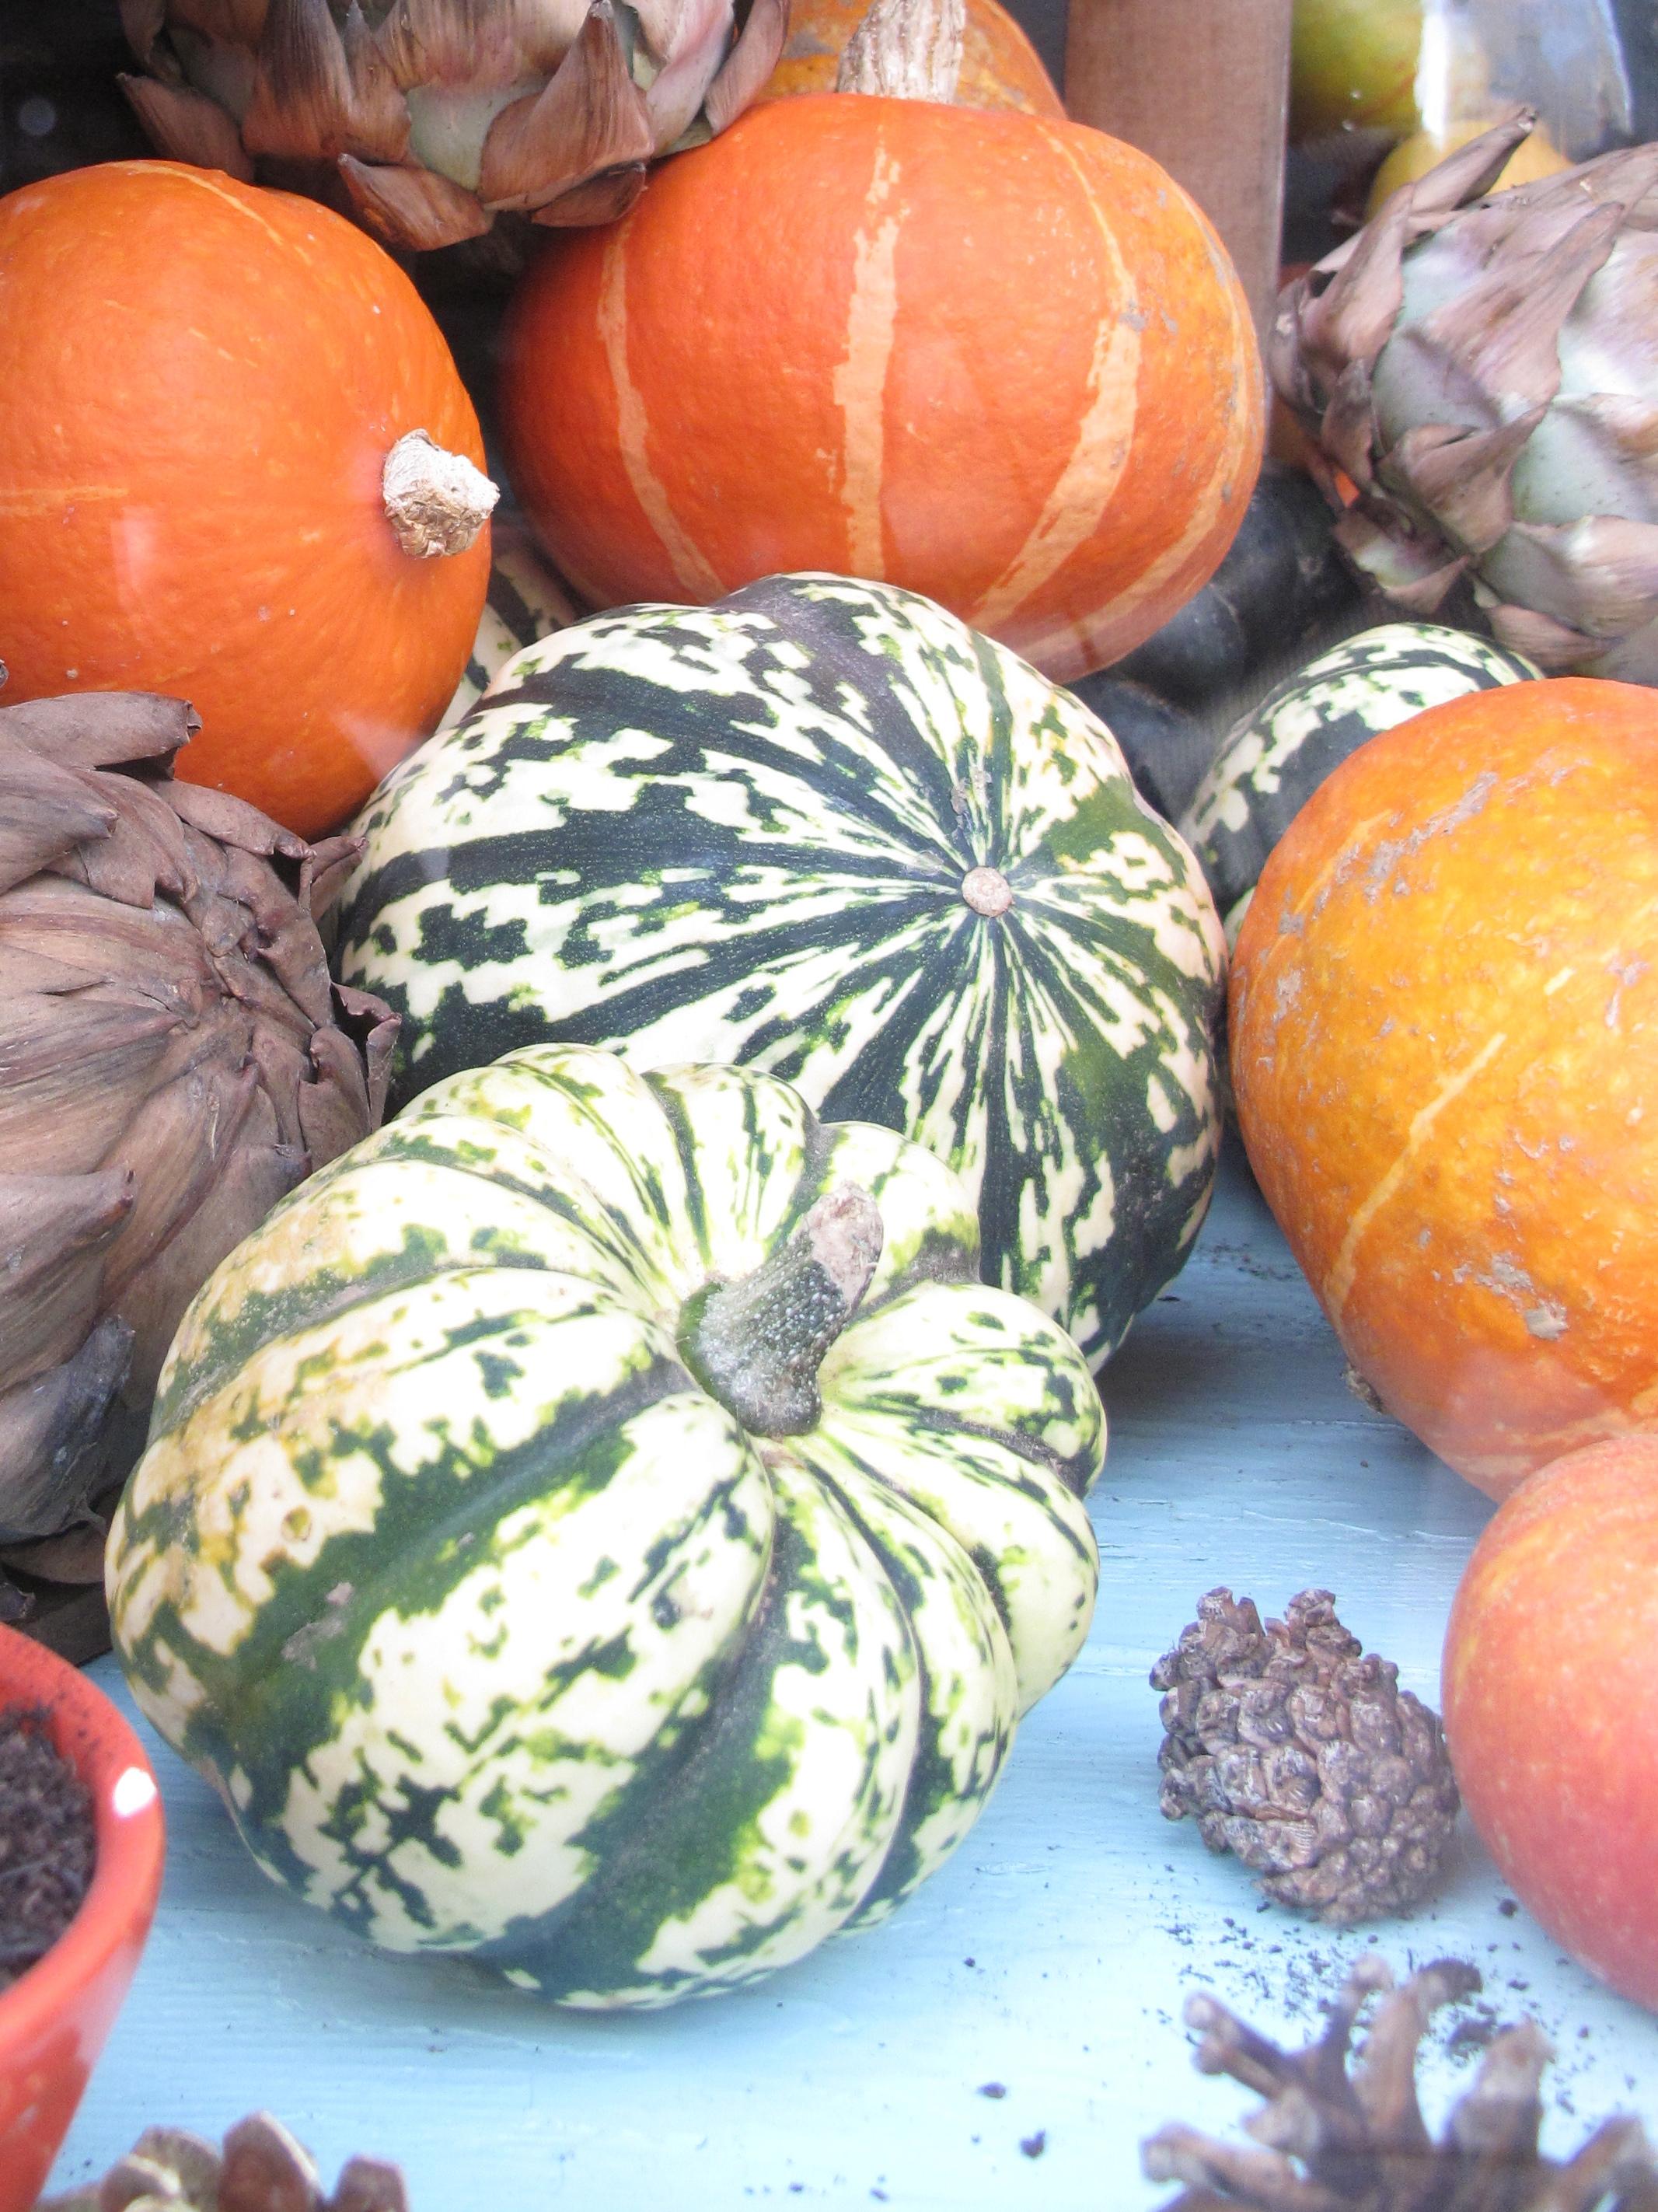 Pumpkins in green and yellow and orange -Love Crumbs window display.